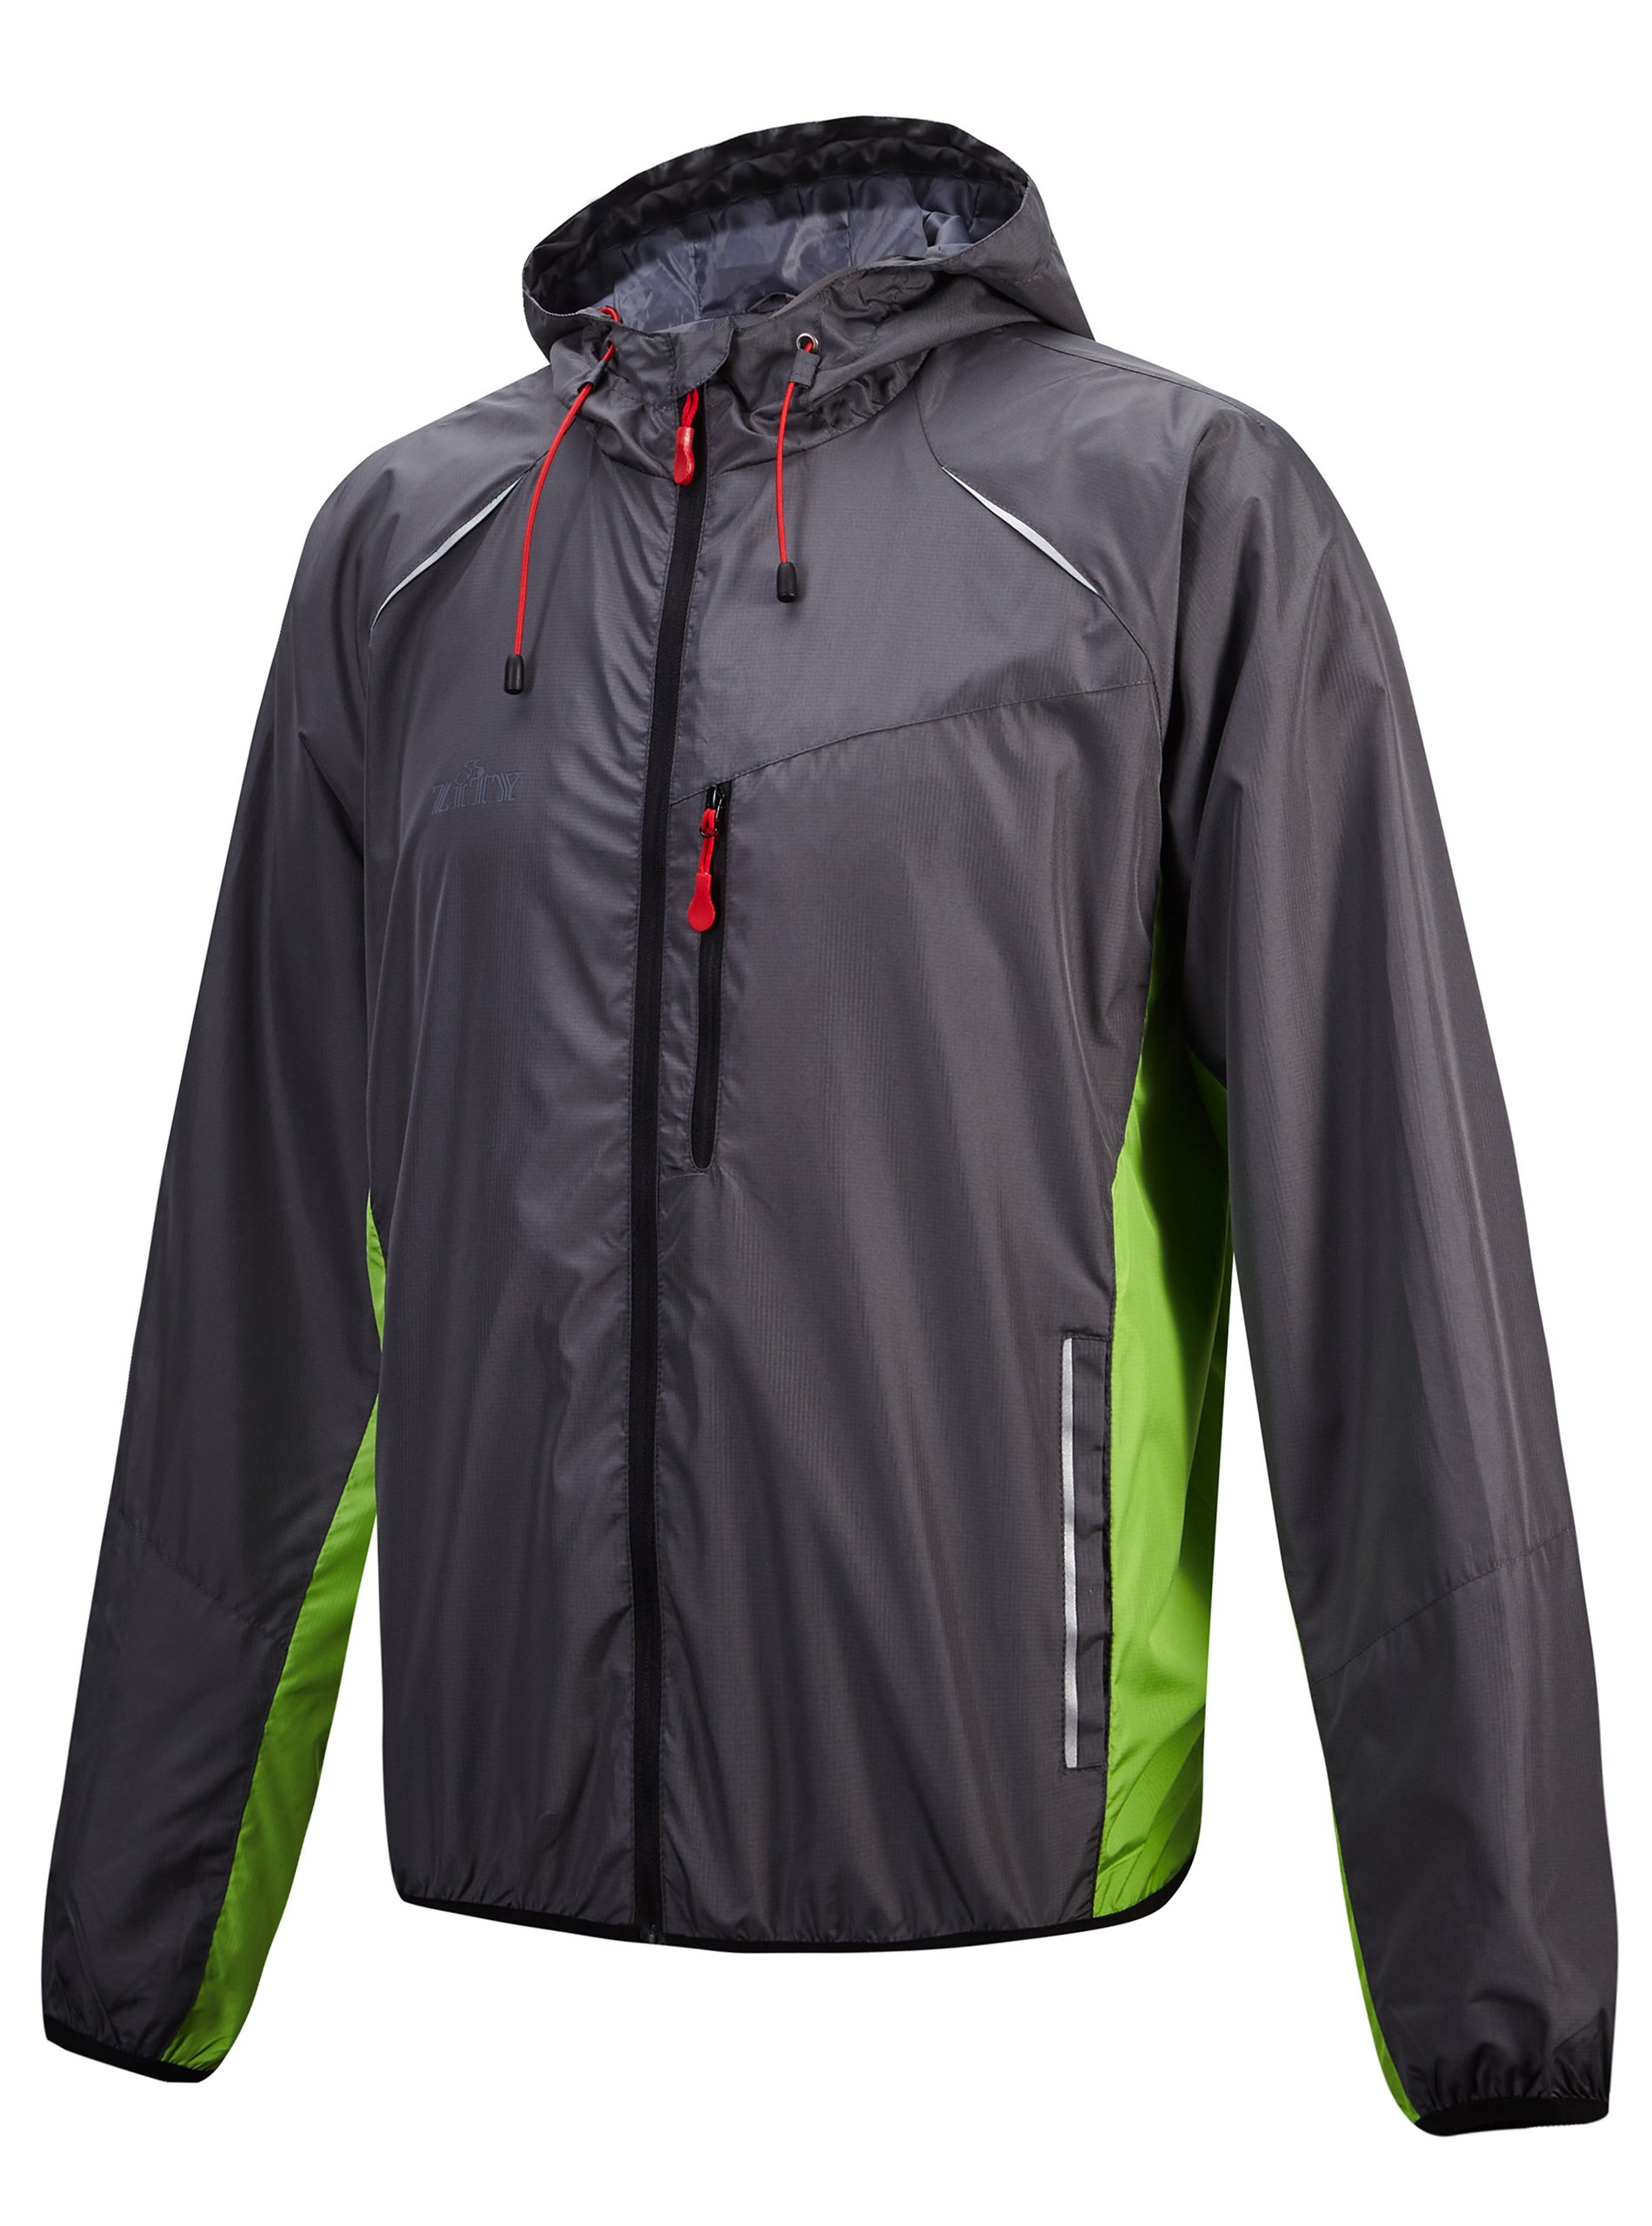 ZITY Cycling Jacket for Mens/Lightweight Hooded Running Biking Jacket Green-1 Small